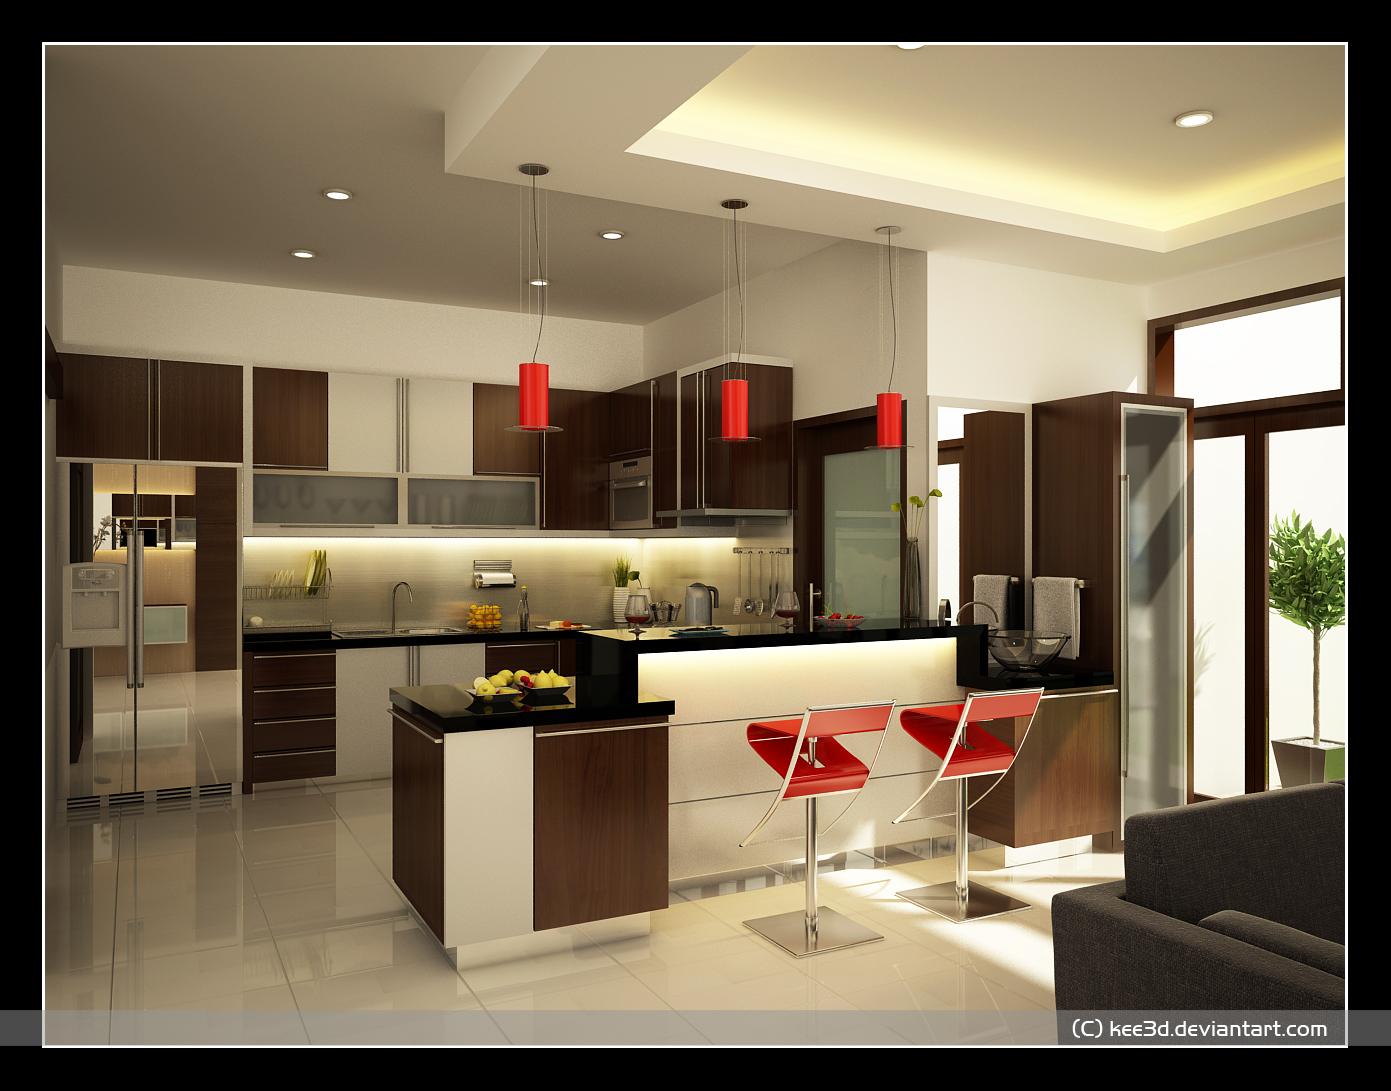 kitchen design ideas set 2 kitchen remodeling ideas by Octo Brilian